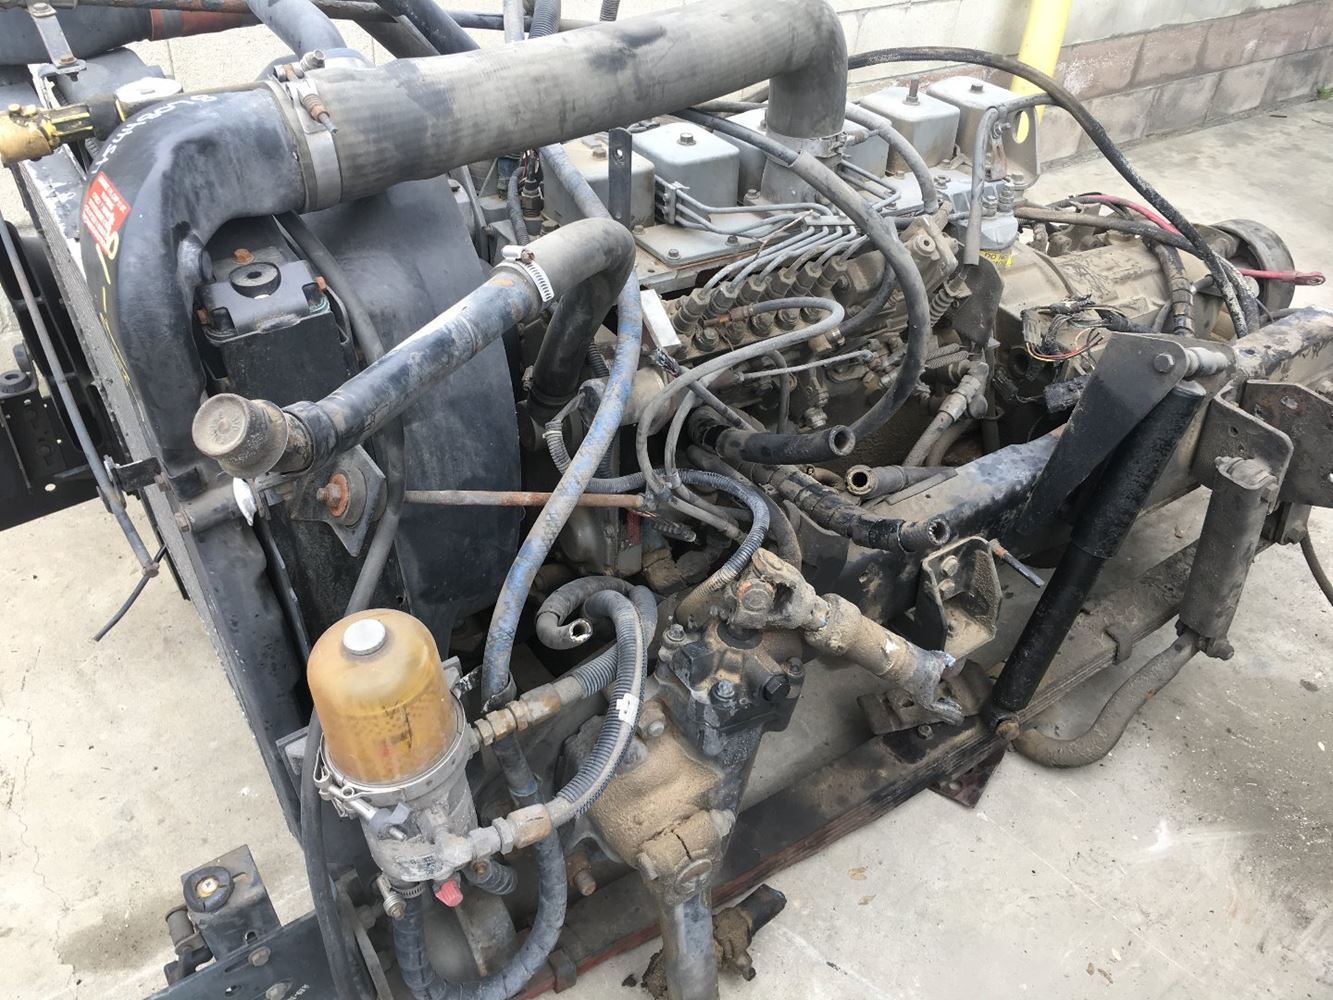 Image for Cummins 6BT 5.9 Engine Assys